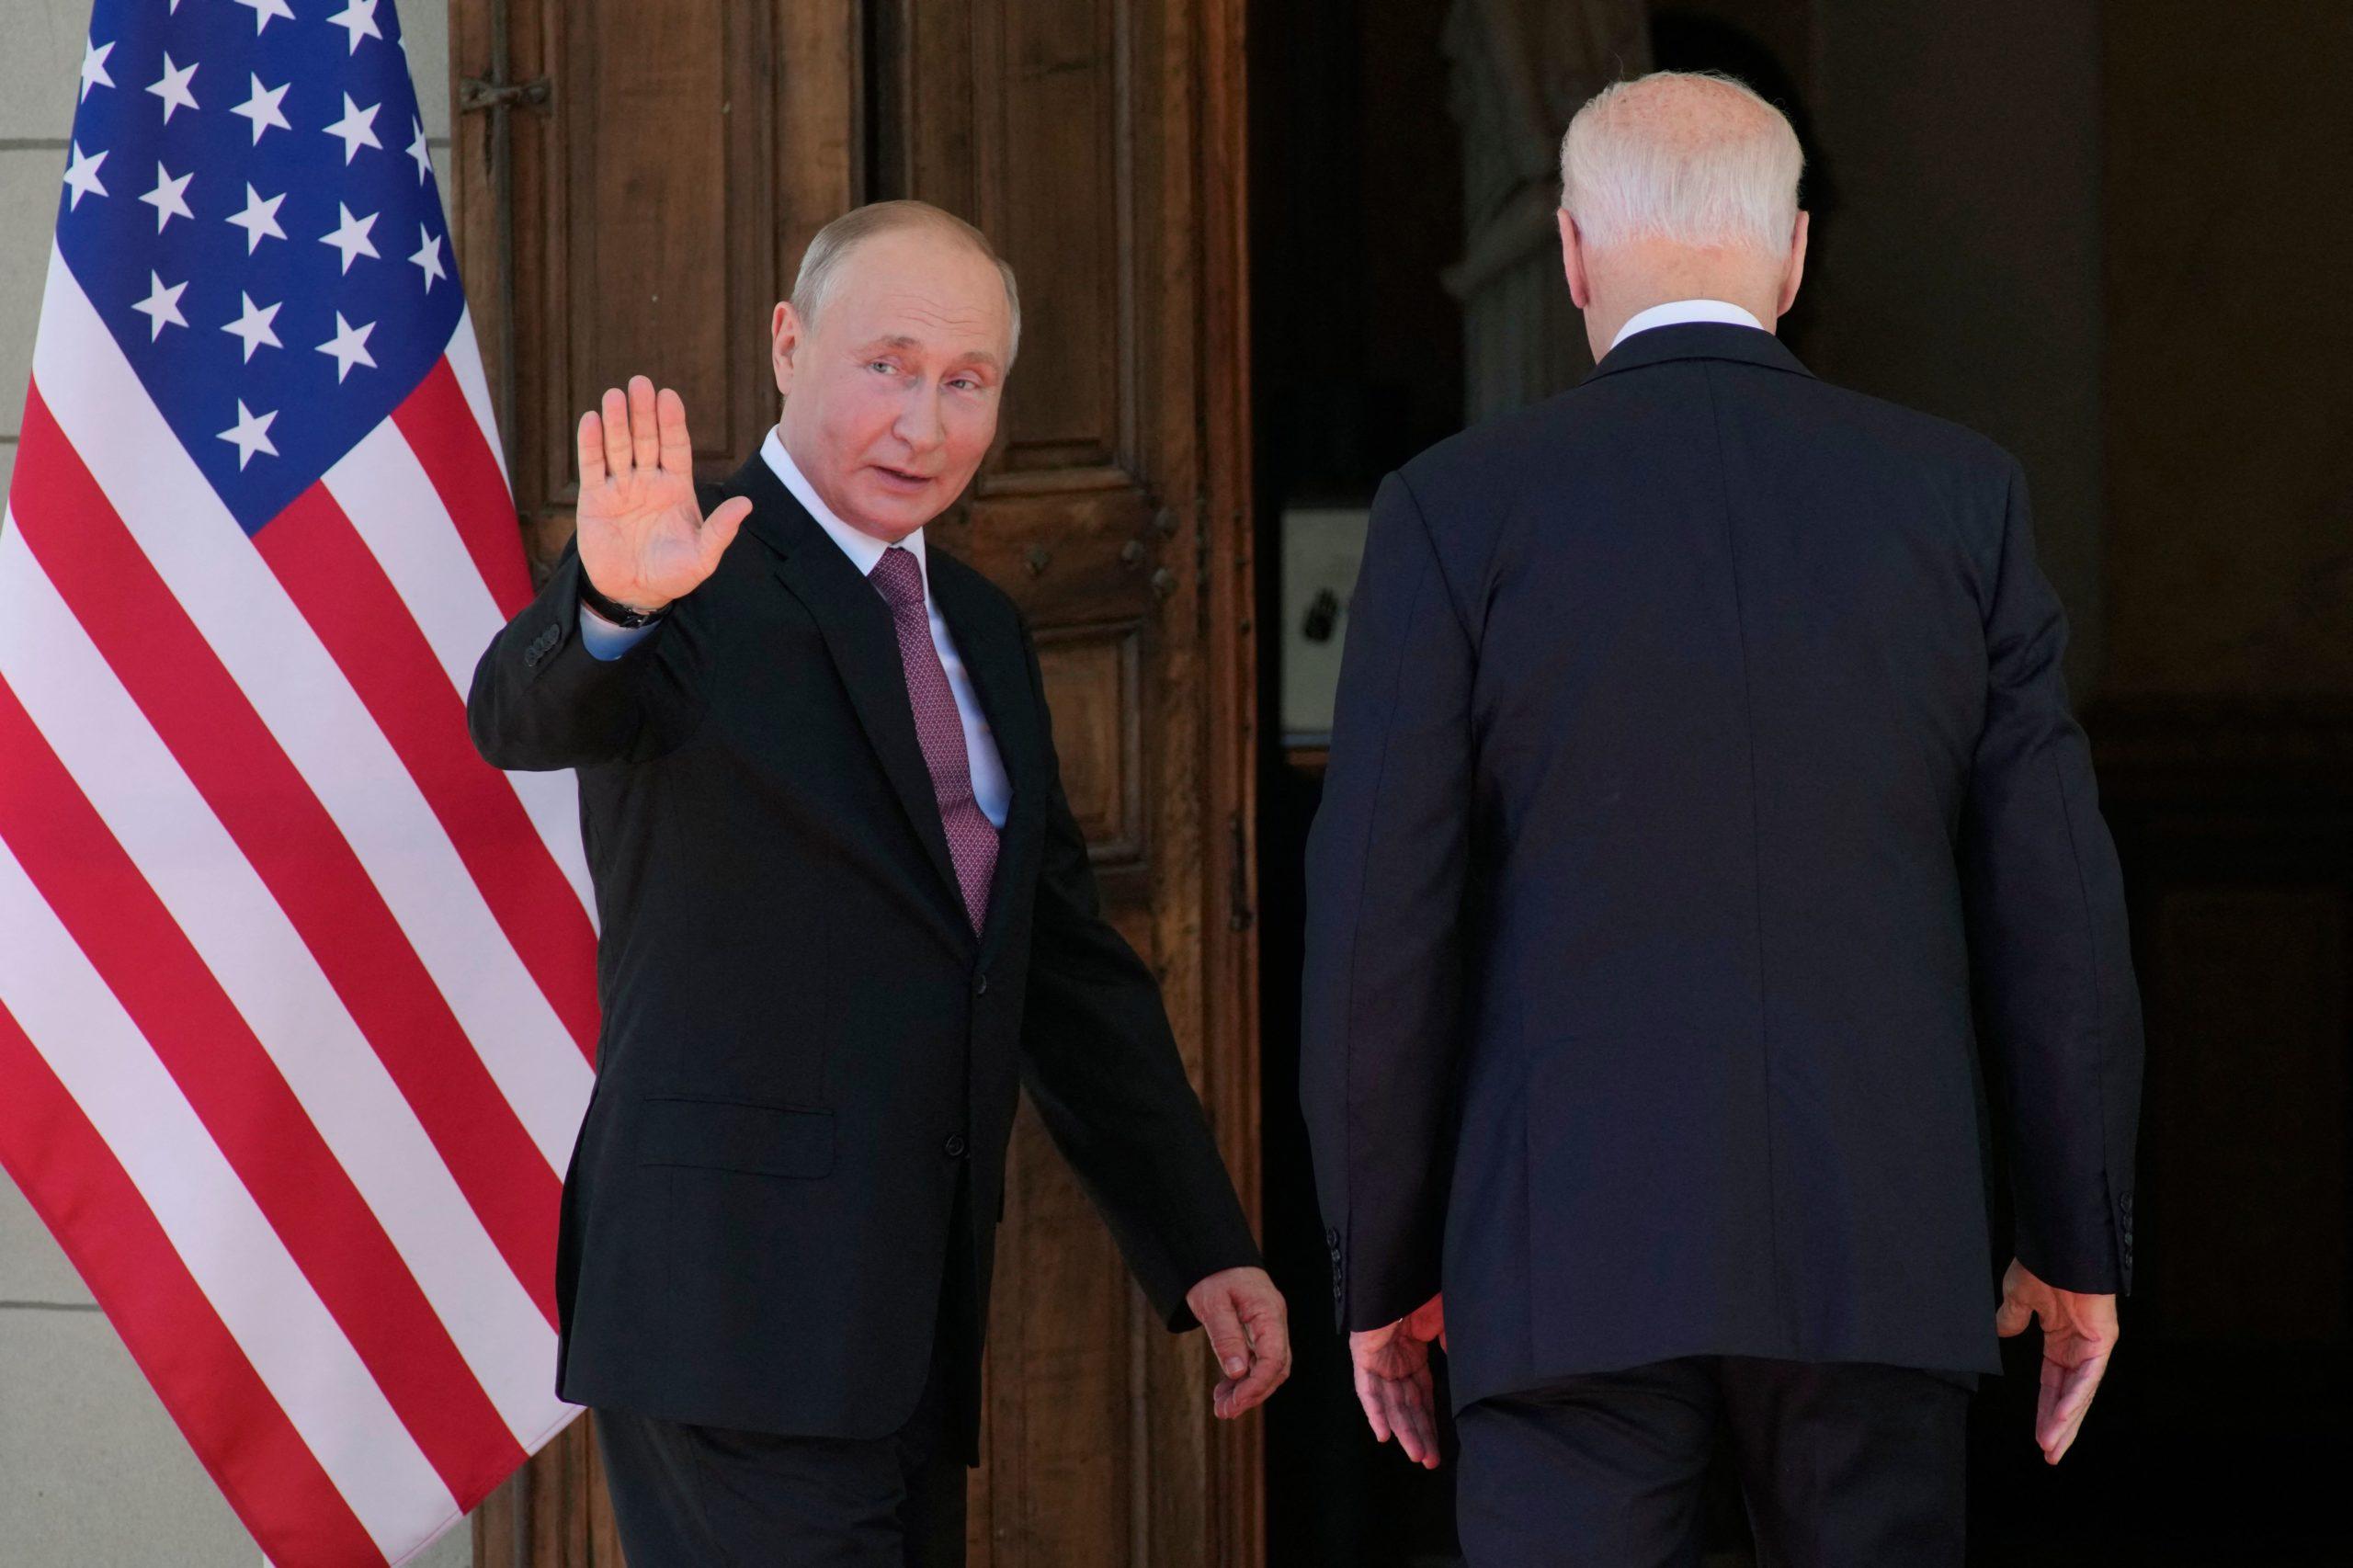 Russian President Vladimir Putin (L) waves next to U.S President Joe Biden as they enter the Villa La Grange for the U.S.-Russia summit, on June 16, 2021 in Geneva. (Photo by Alexander Zemlianichenko / POOL / AFP) (Photo by ALEXANDER ZEMLIANICHENKO/POOL/AFP via Getty Images)